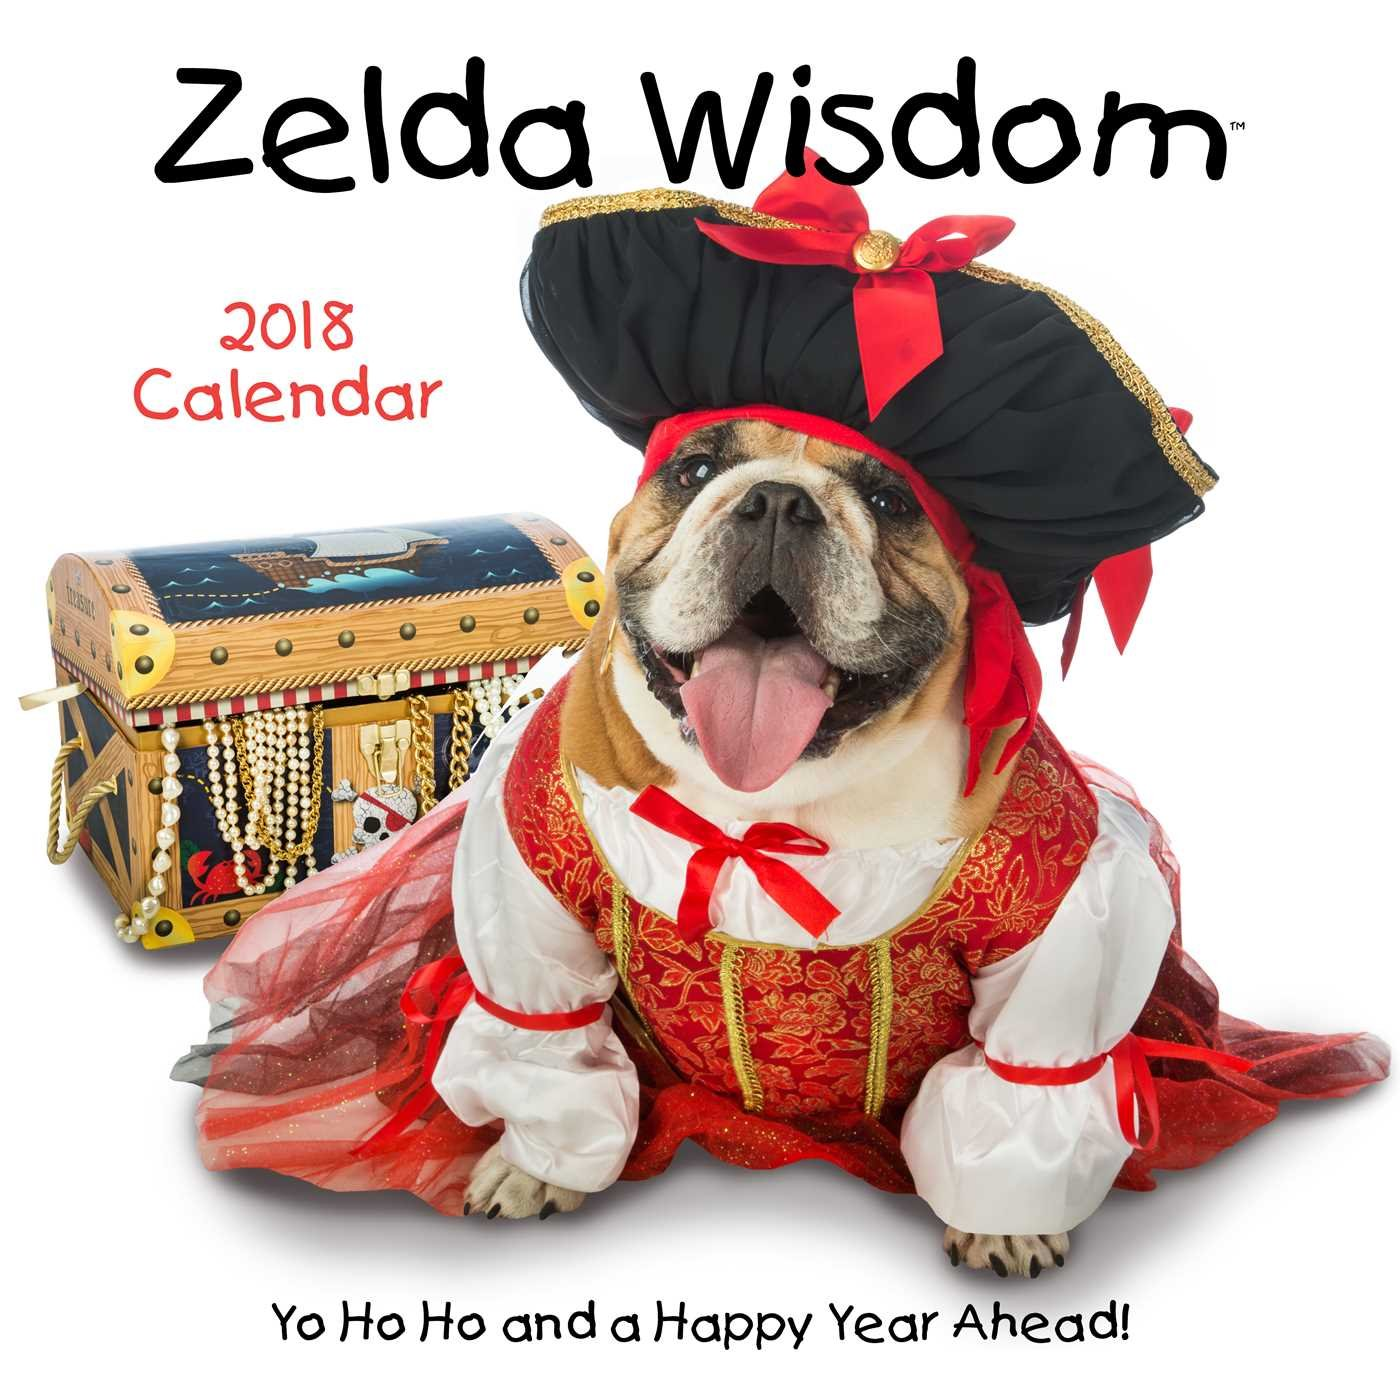 Zelda Wisdom 2018 Wall Calendar product image